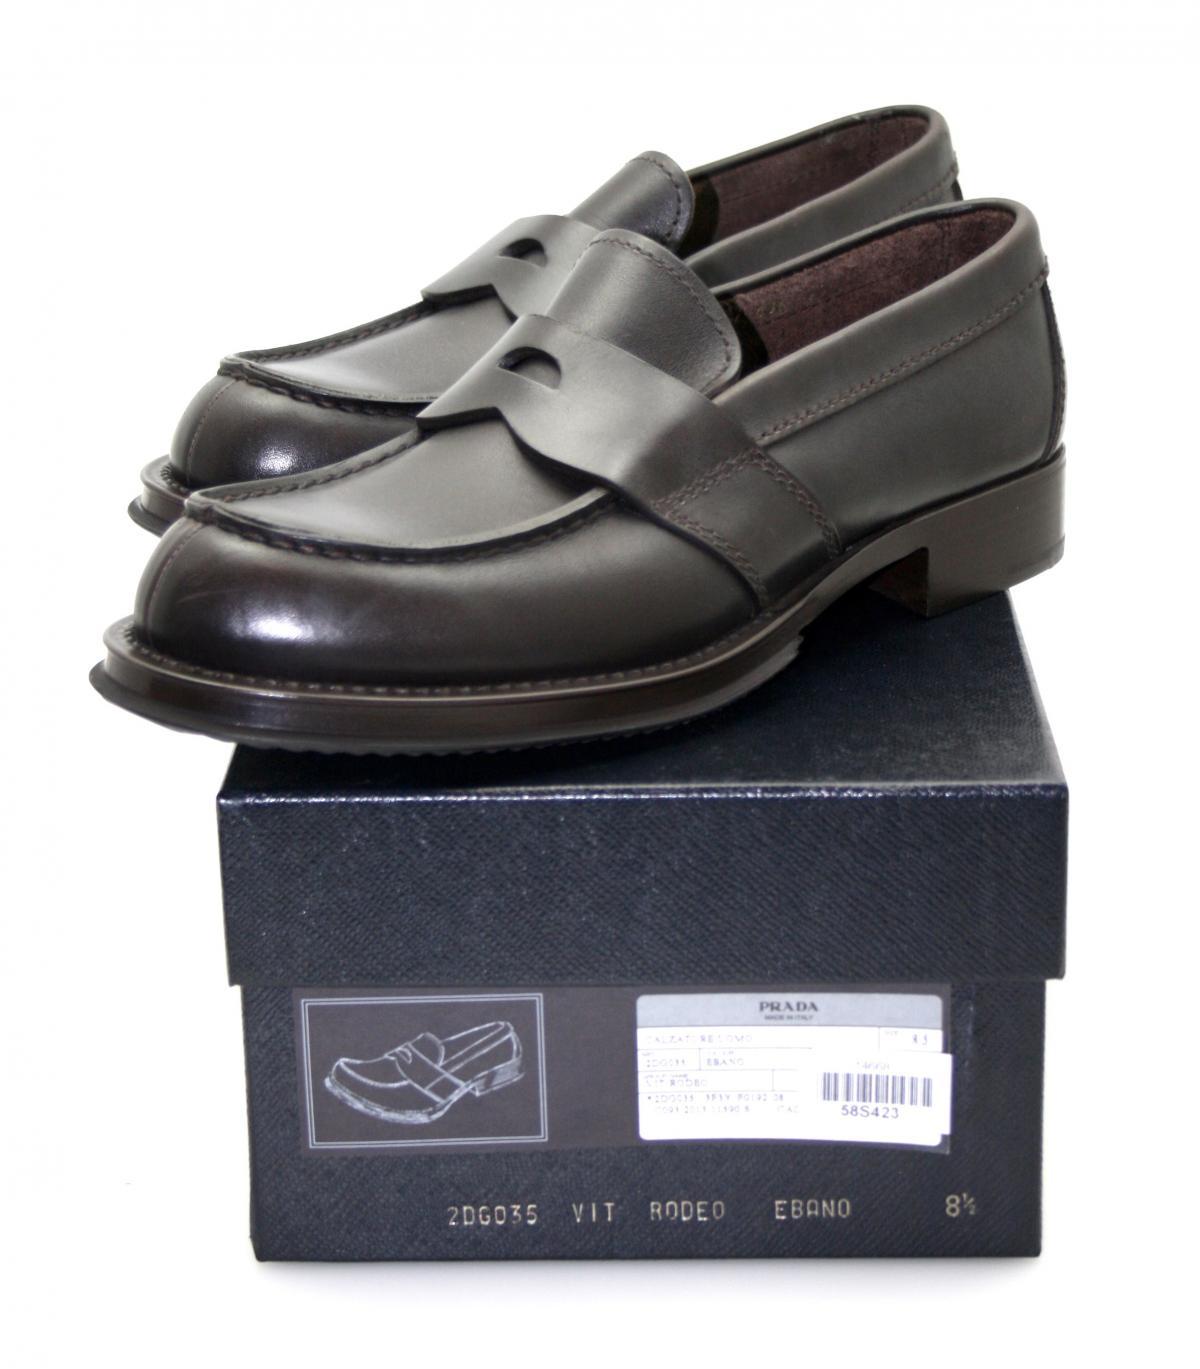 luxus prada slipper schuhe pennyloafer 2dg035 braun neu 8 5 42 5 43 ebay. Black Bedroom Furniture Sets. Home Design Ideas